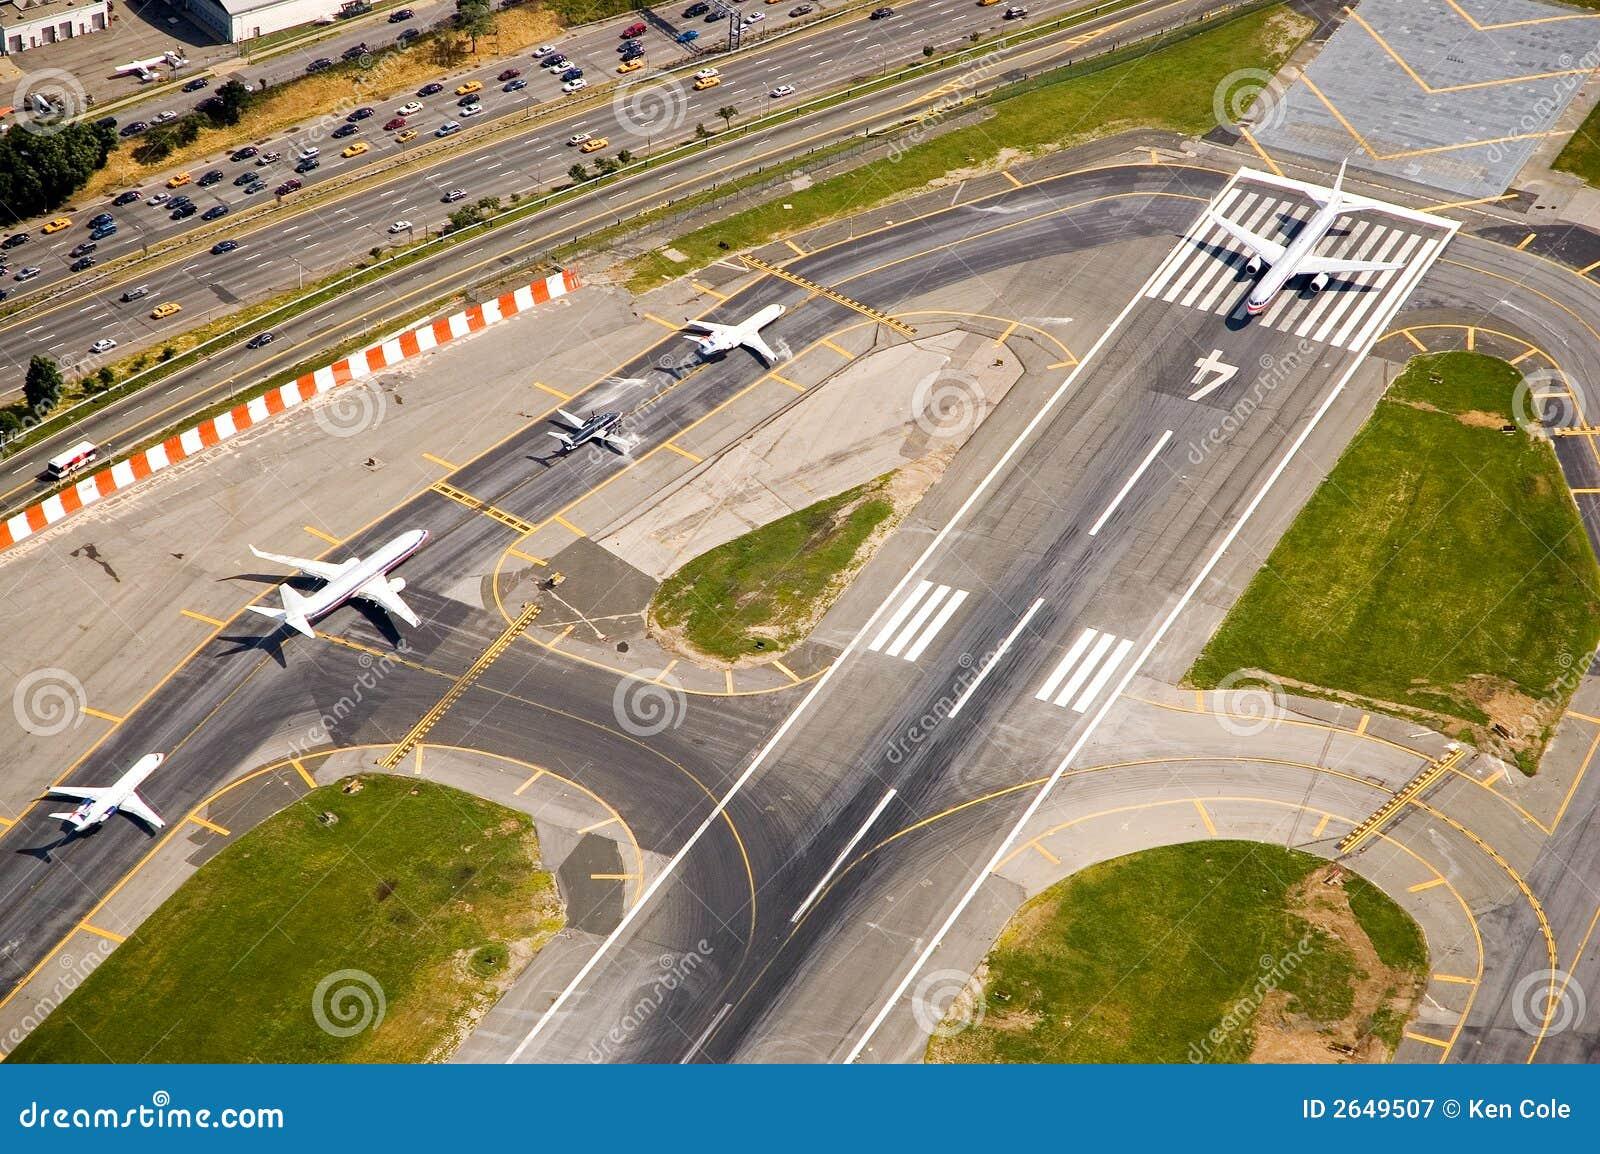 aeroplane landing area guideline dimension